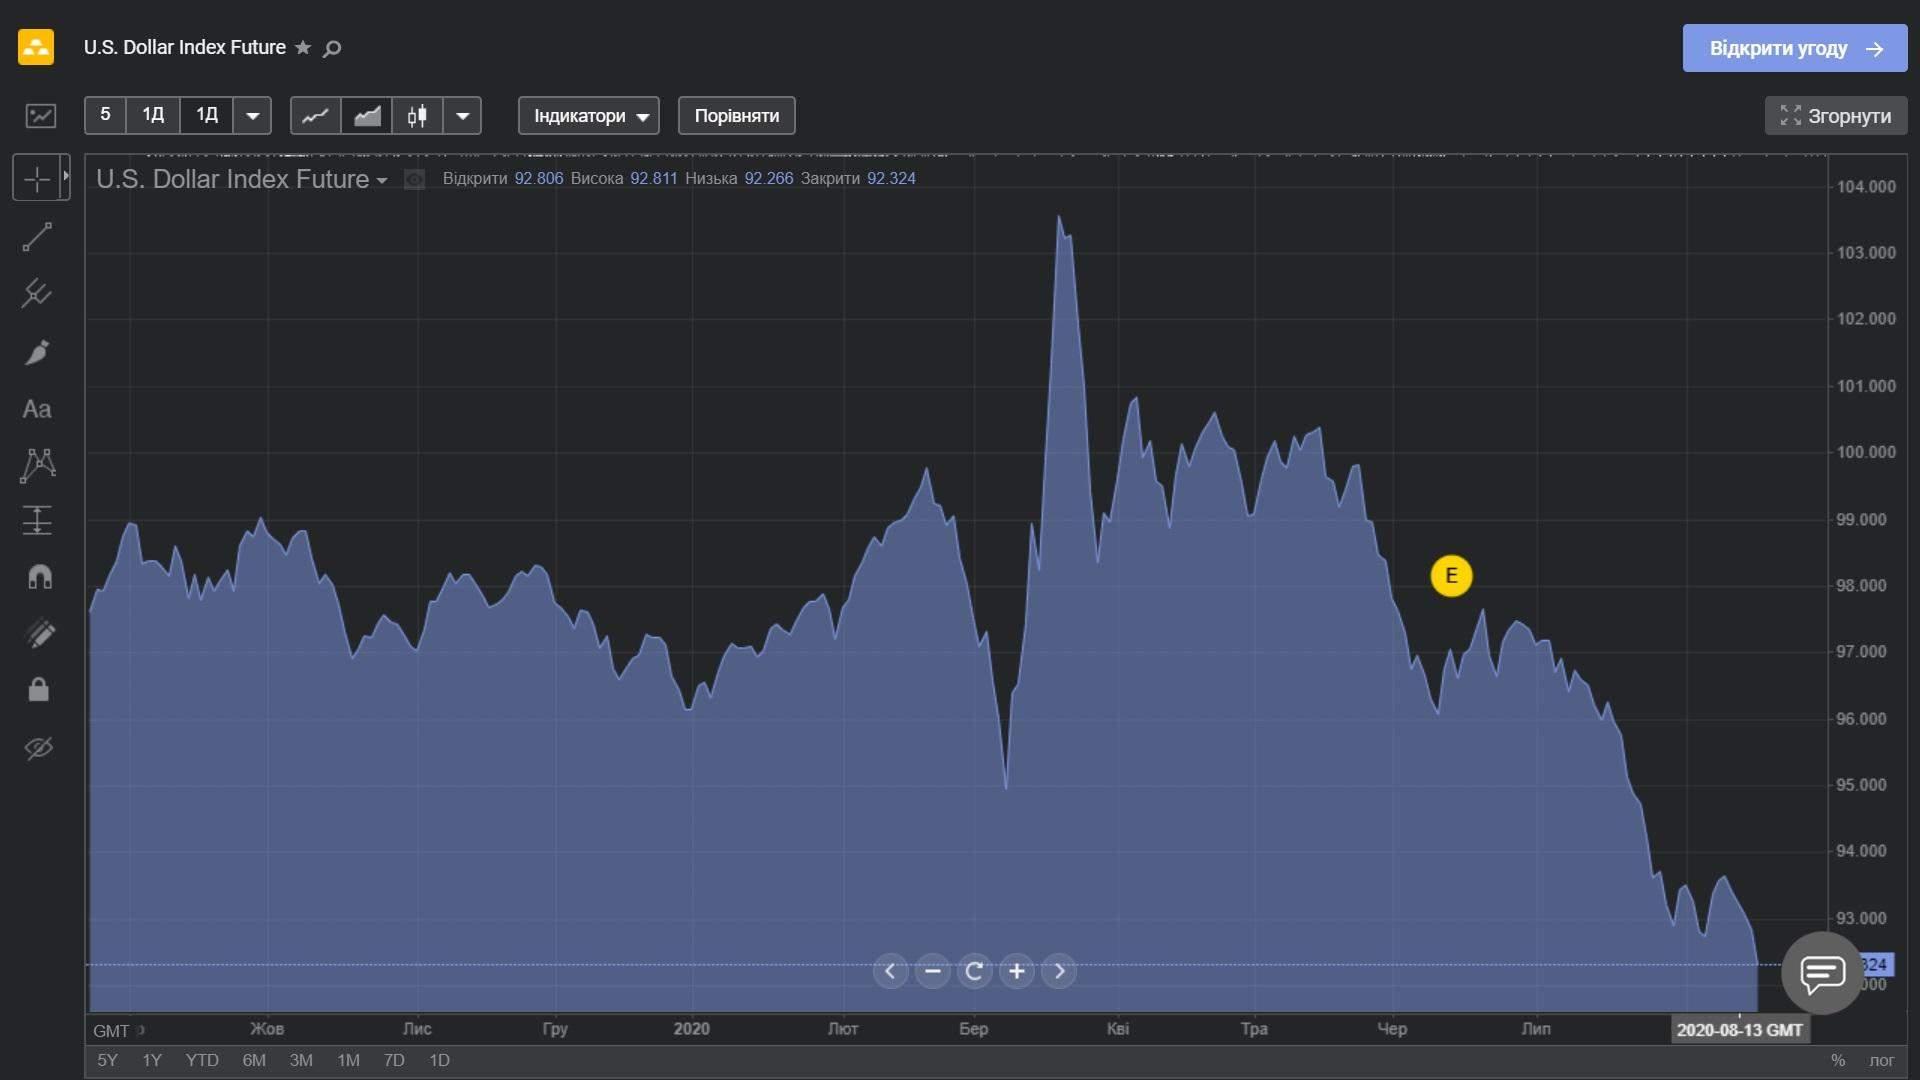 Індекс долара за рік